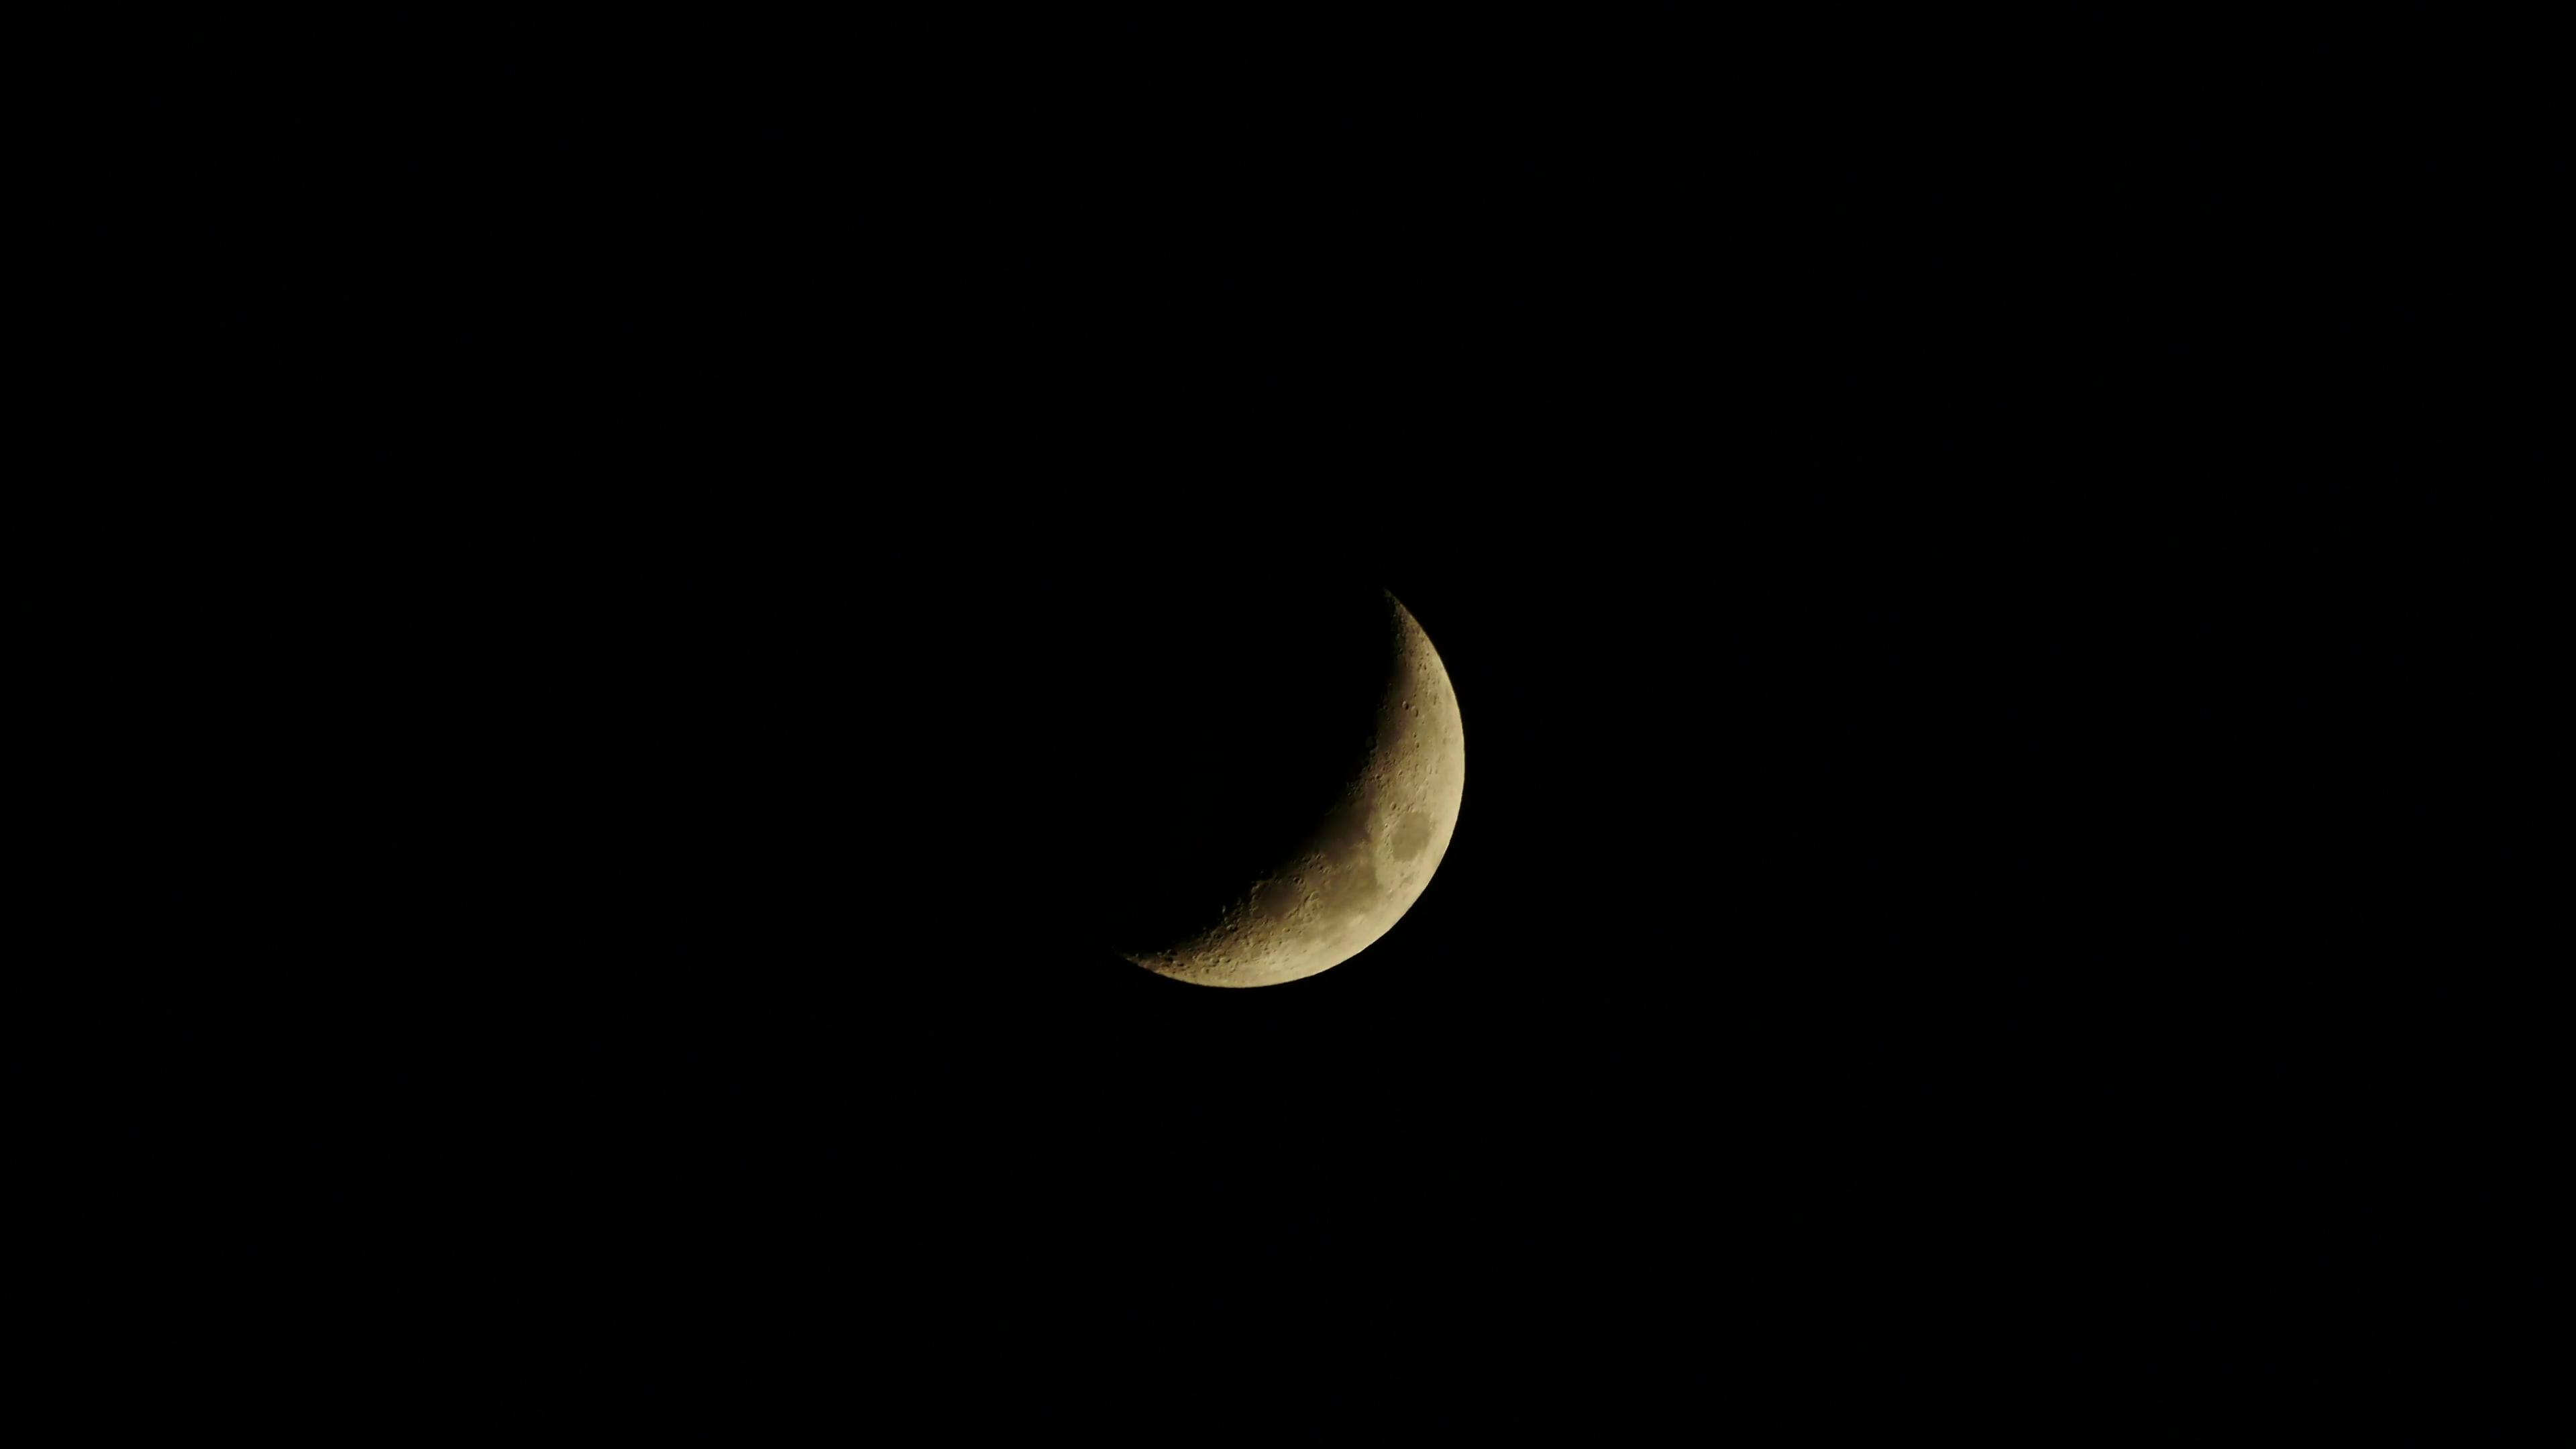 half moon. night sky. moonshine. moon light. 4K background Stock Video  Footage - Storyblocks Video